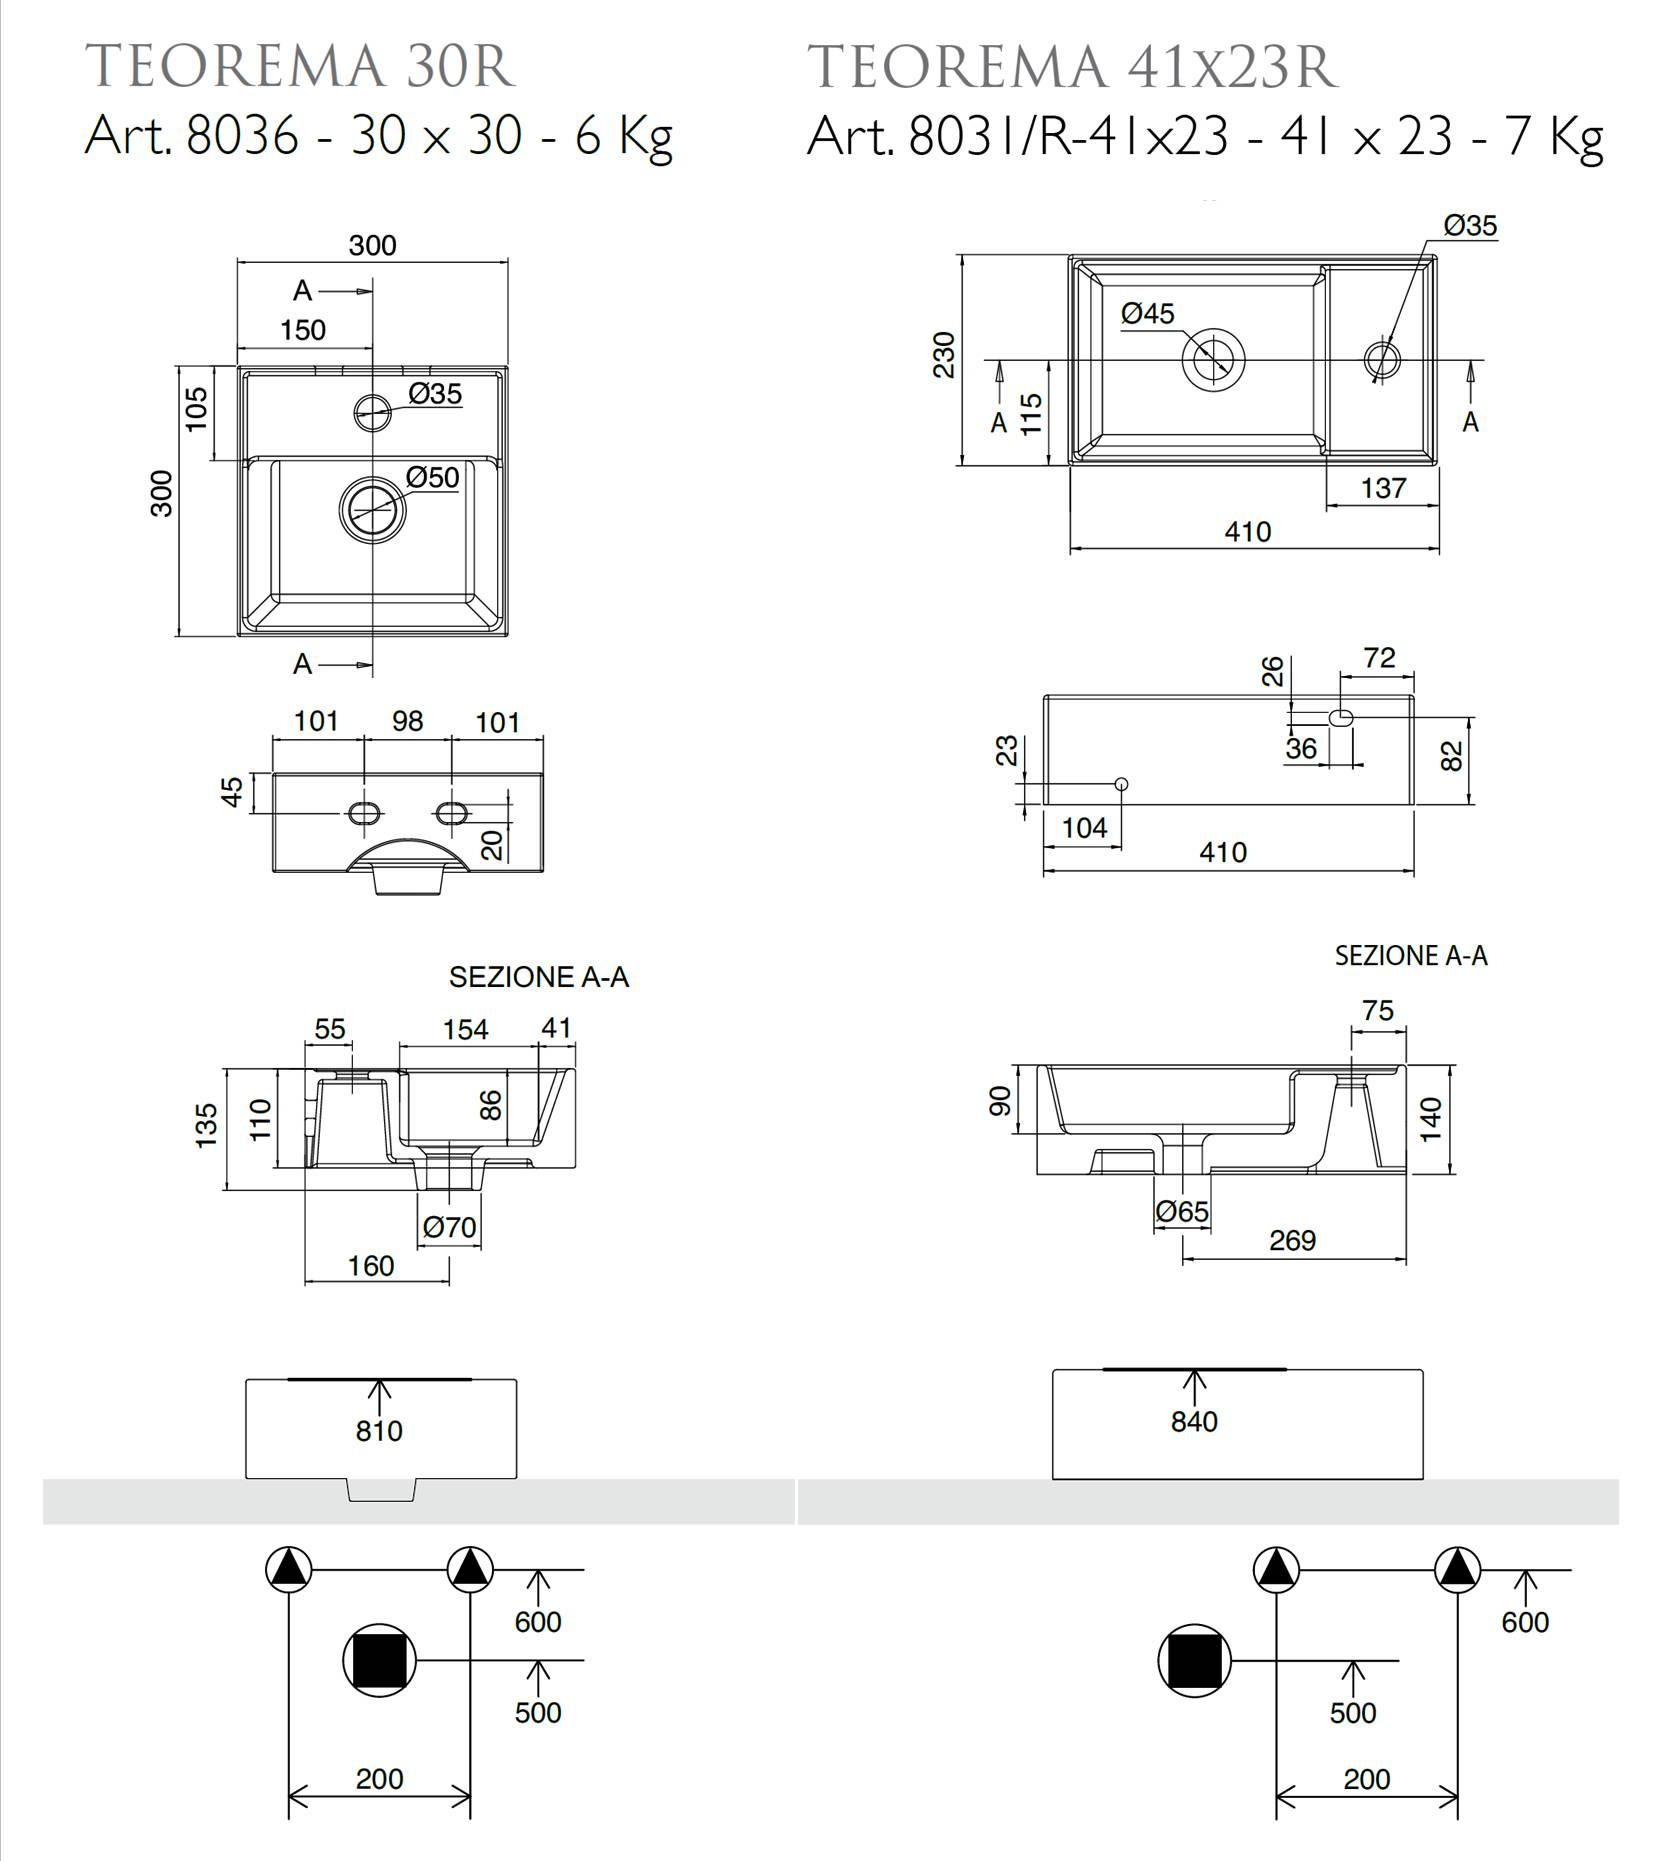 sceda_tecnica_washbasin_suspended_30x30_41x23_teorema_scarabeo